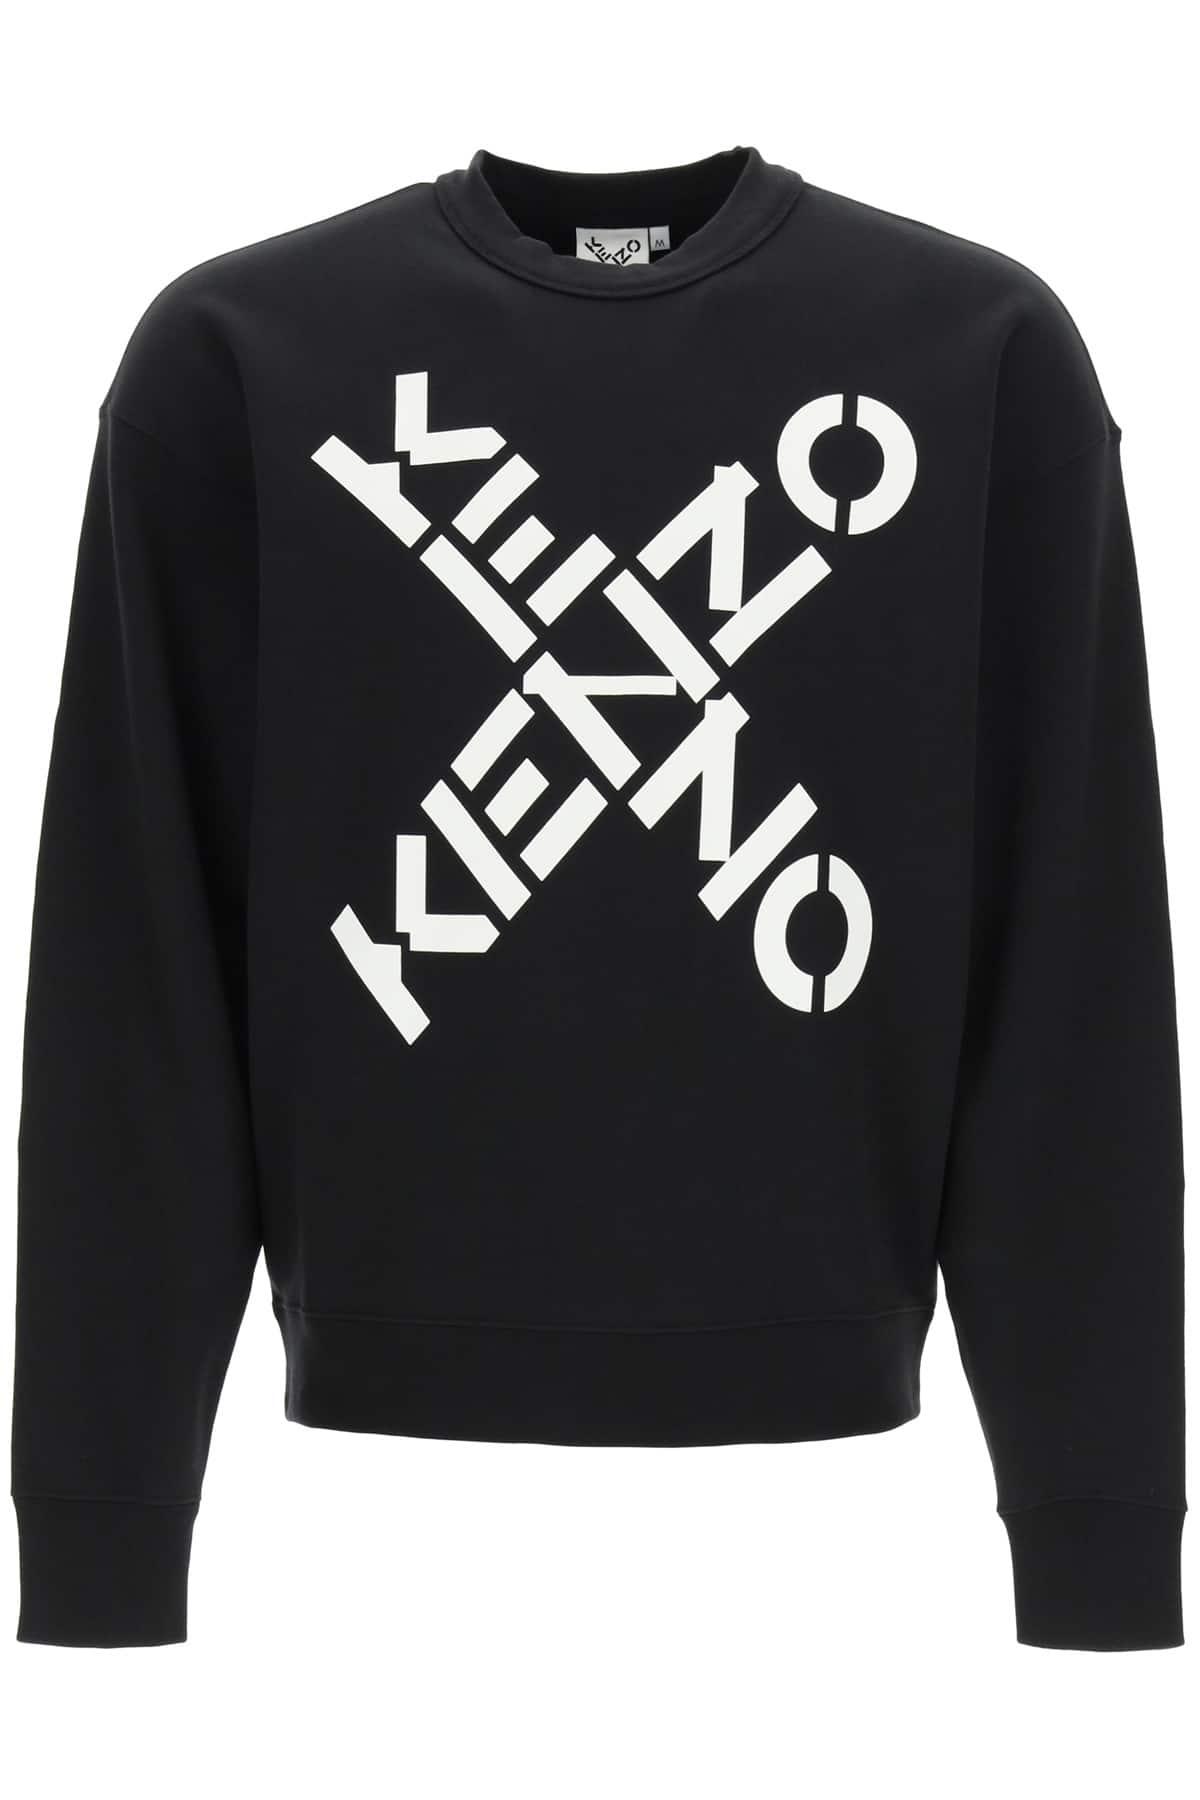 KENZO KENZO SPORT BIG X SWEATSHIRT XL Black, White Cotton